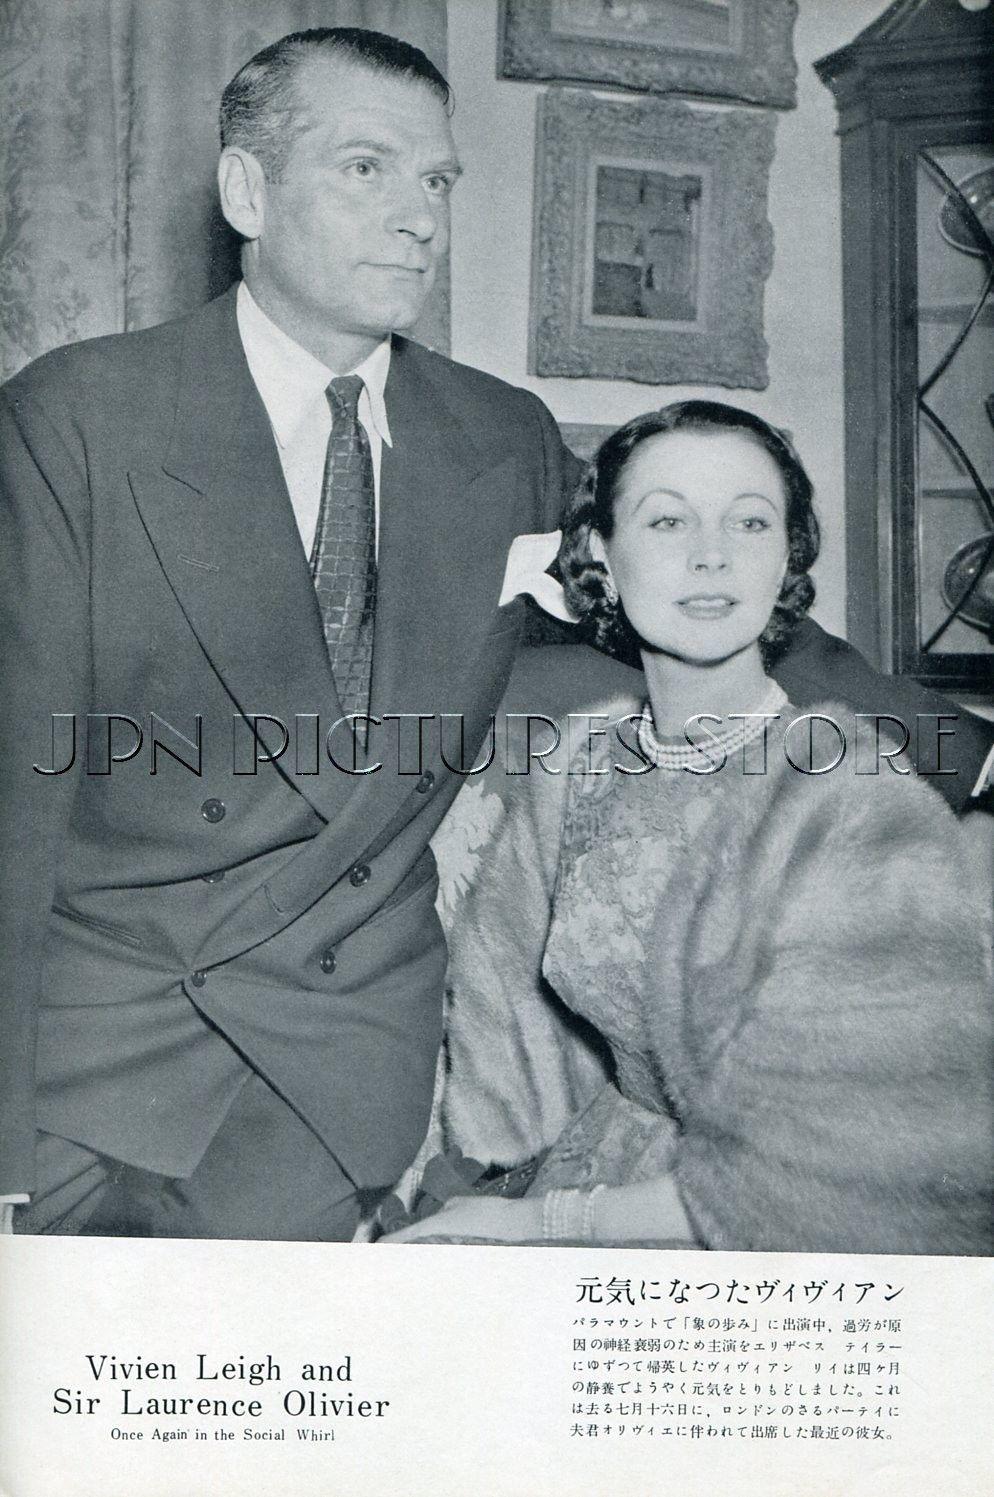 Vivien Leigh Laurence Olivier Kirk Douglas 1953 JPN Picture clipping 7x10 DD P | eBay